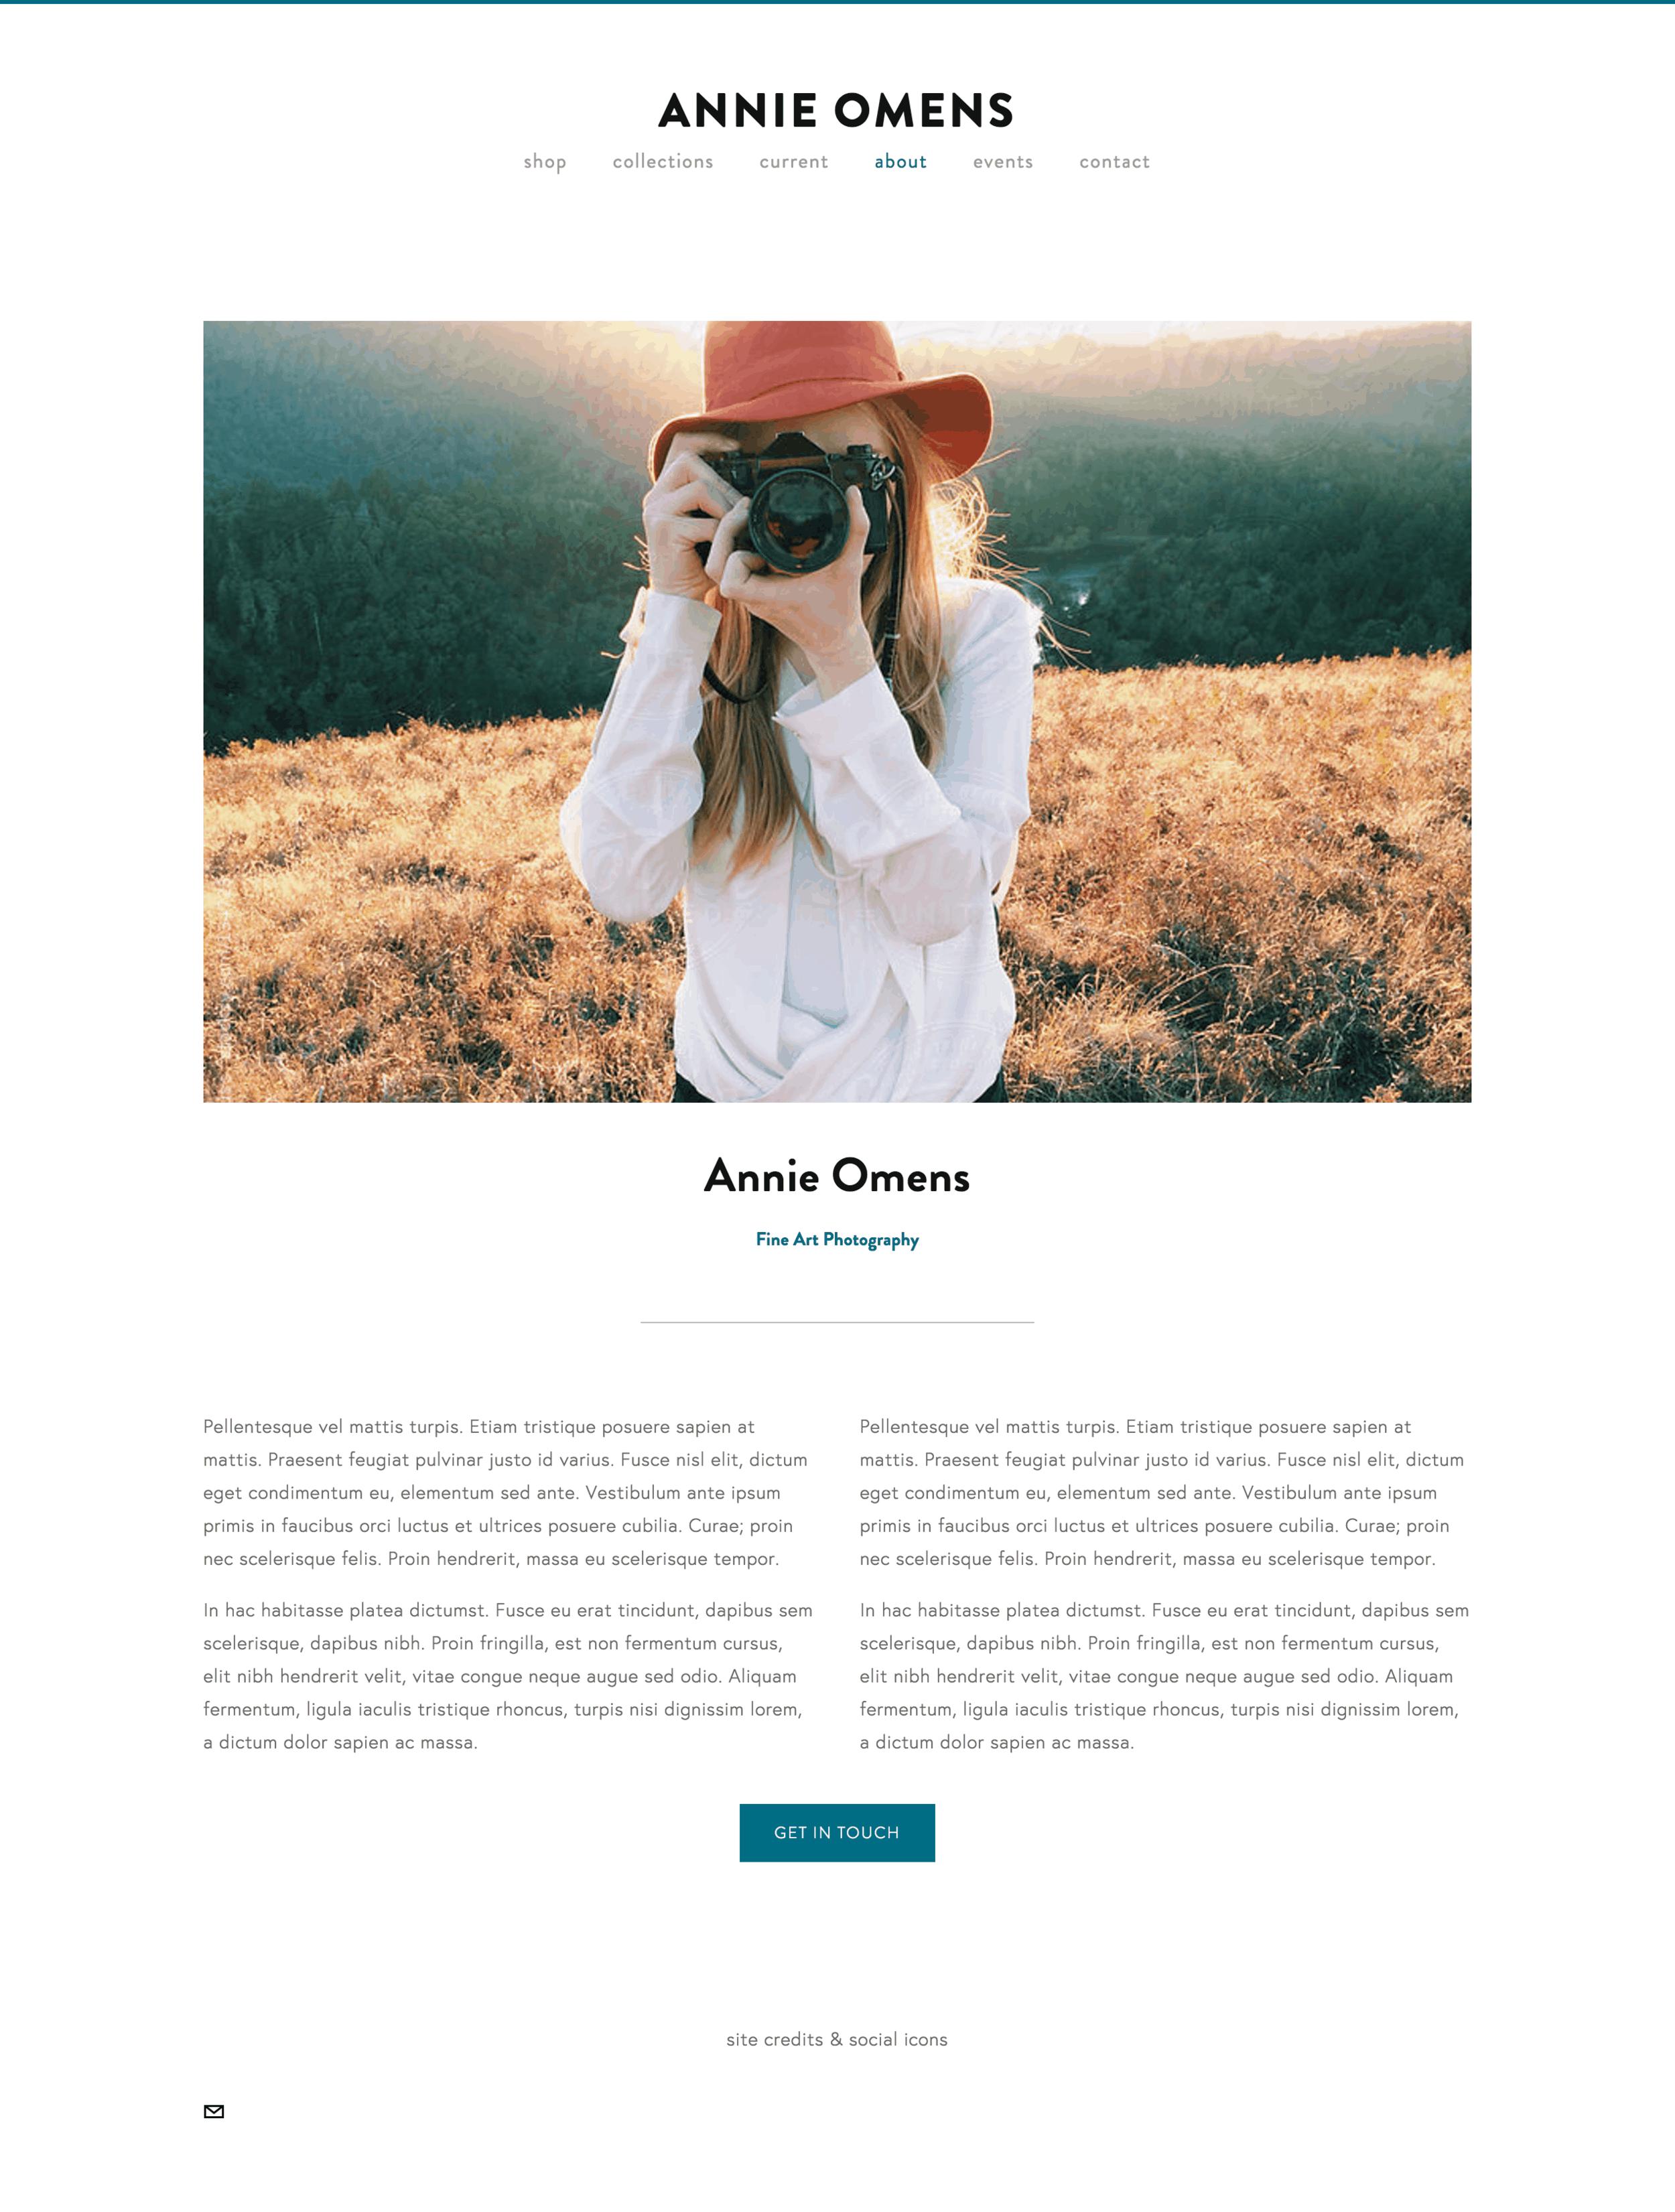 About page design idea by Sarah Moon. #squarespace #webdesign #artistwebsite #photographers